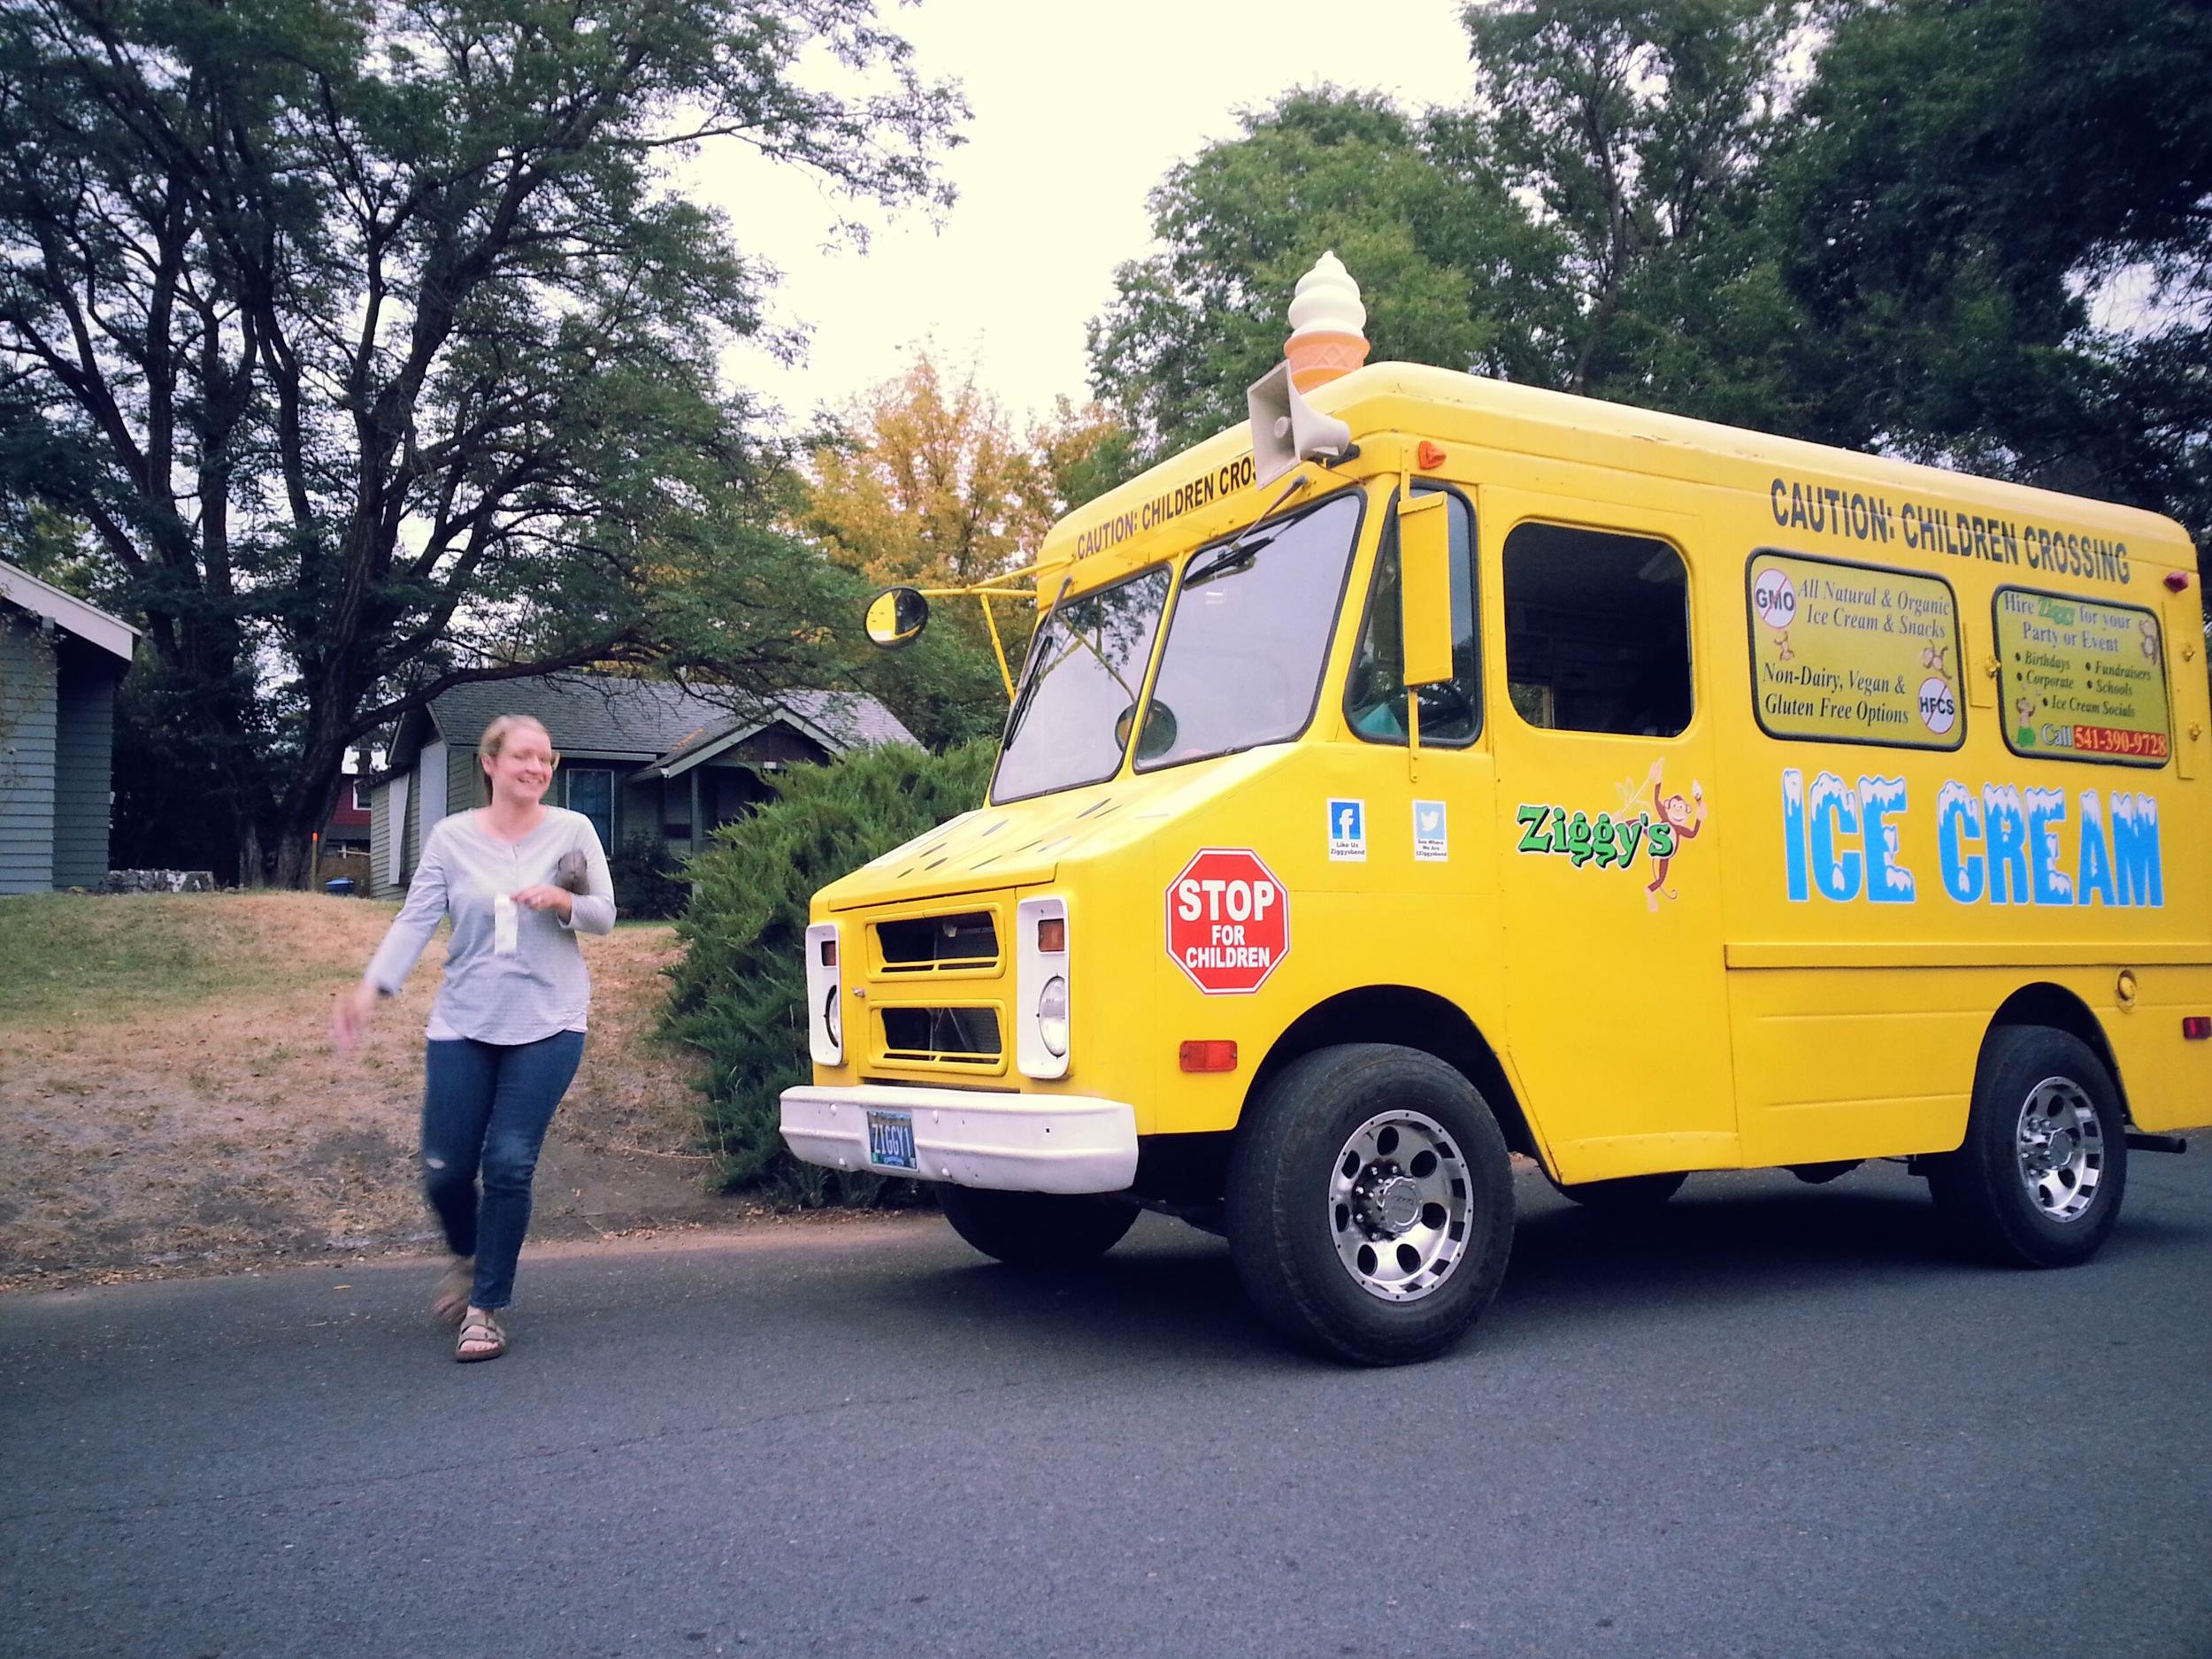 Ice-cream-truck_heatherbyhand.jpg